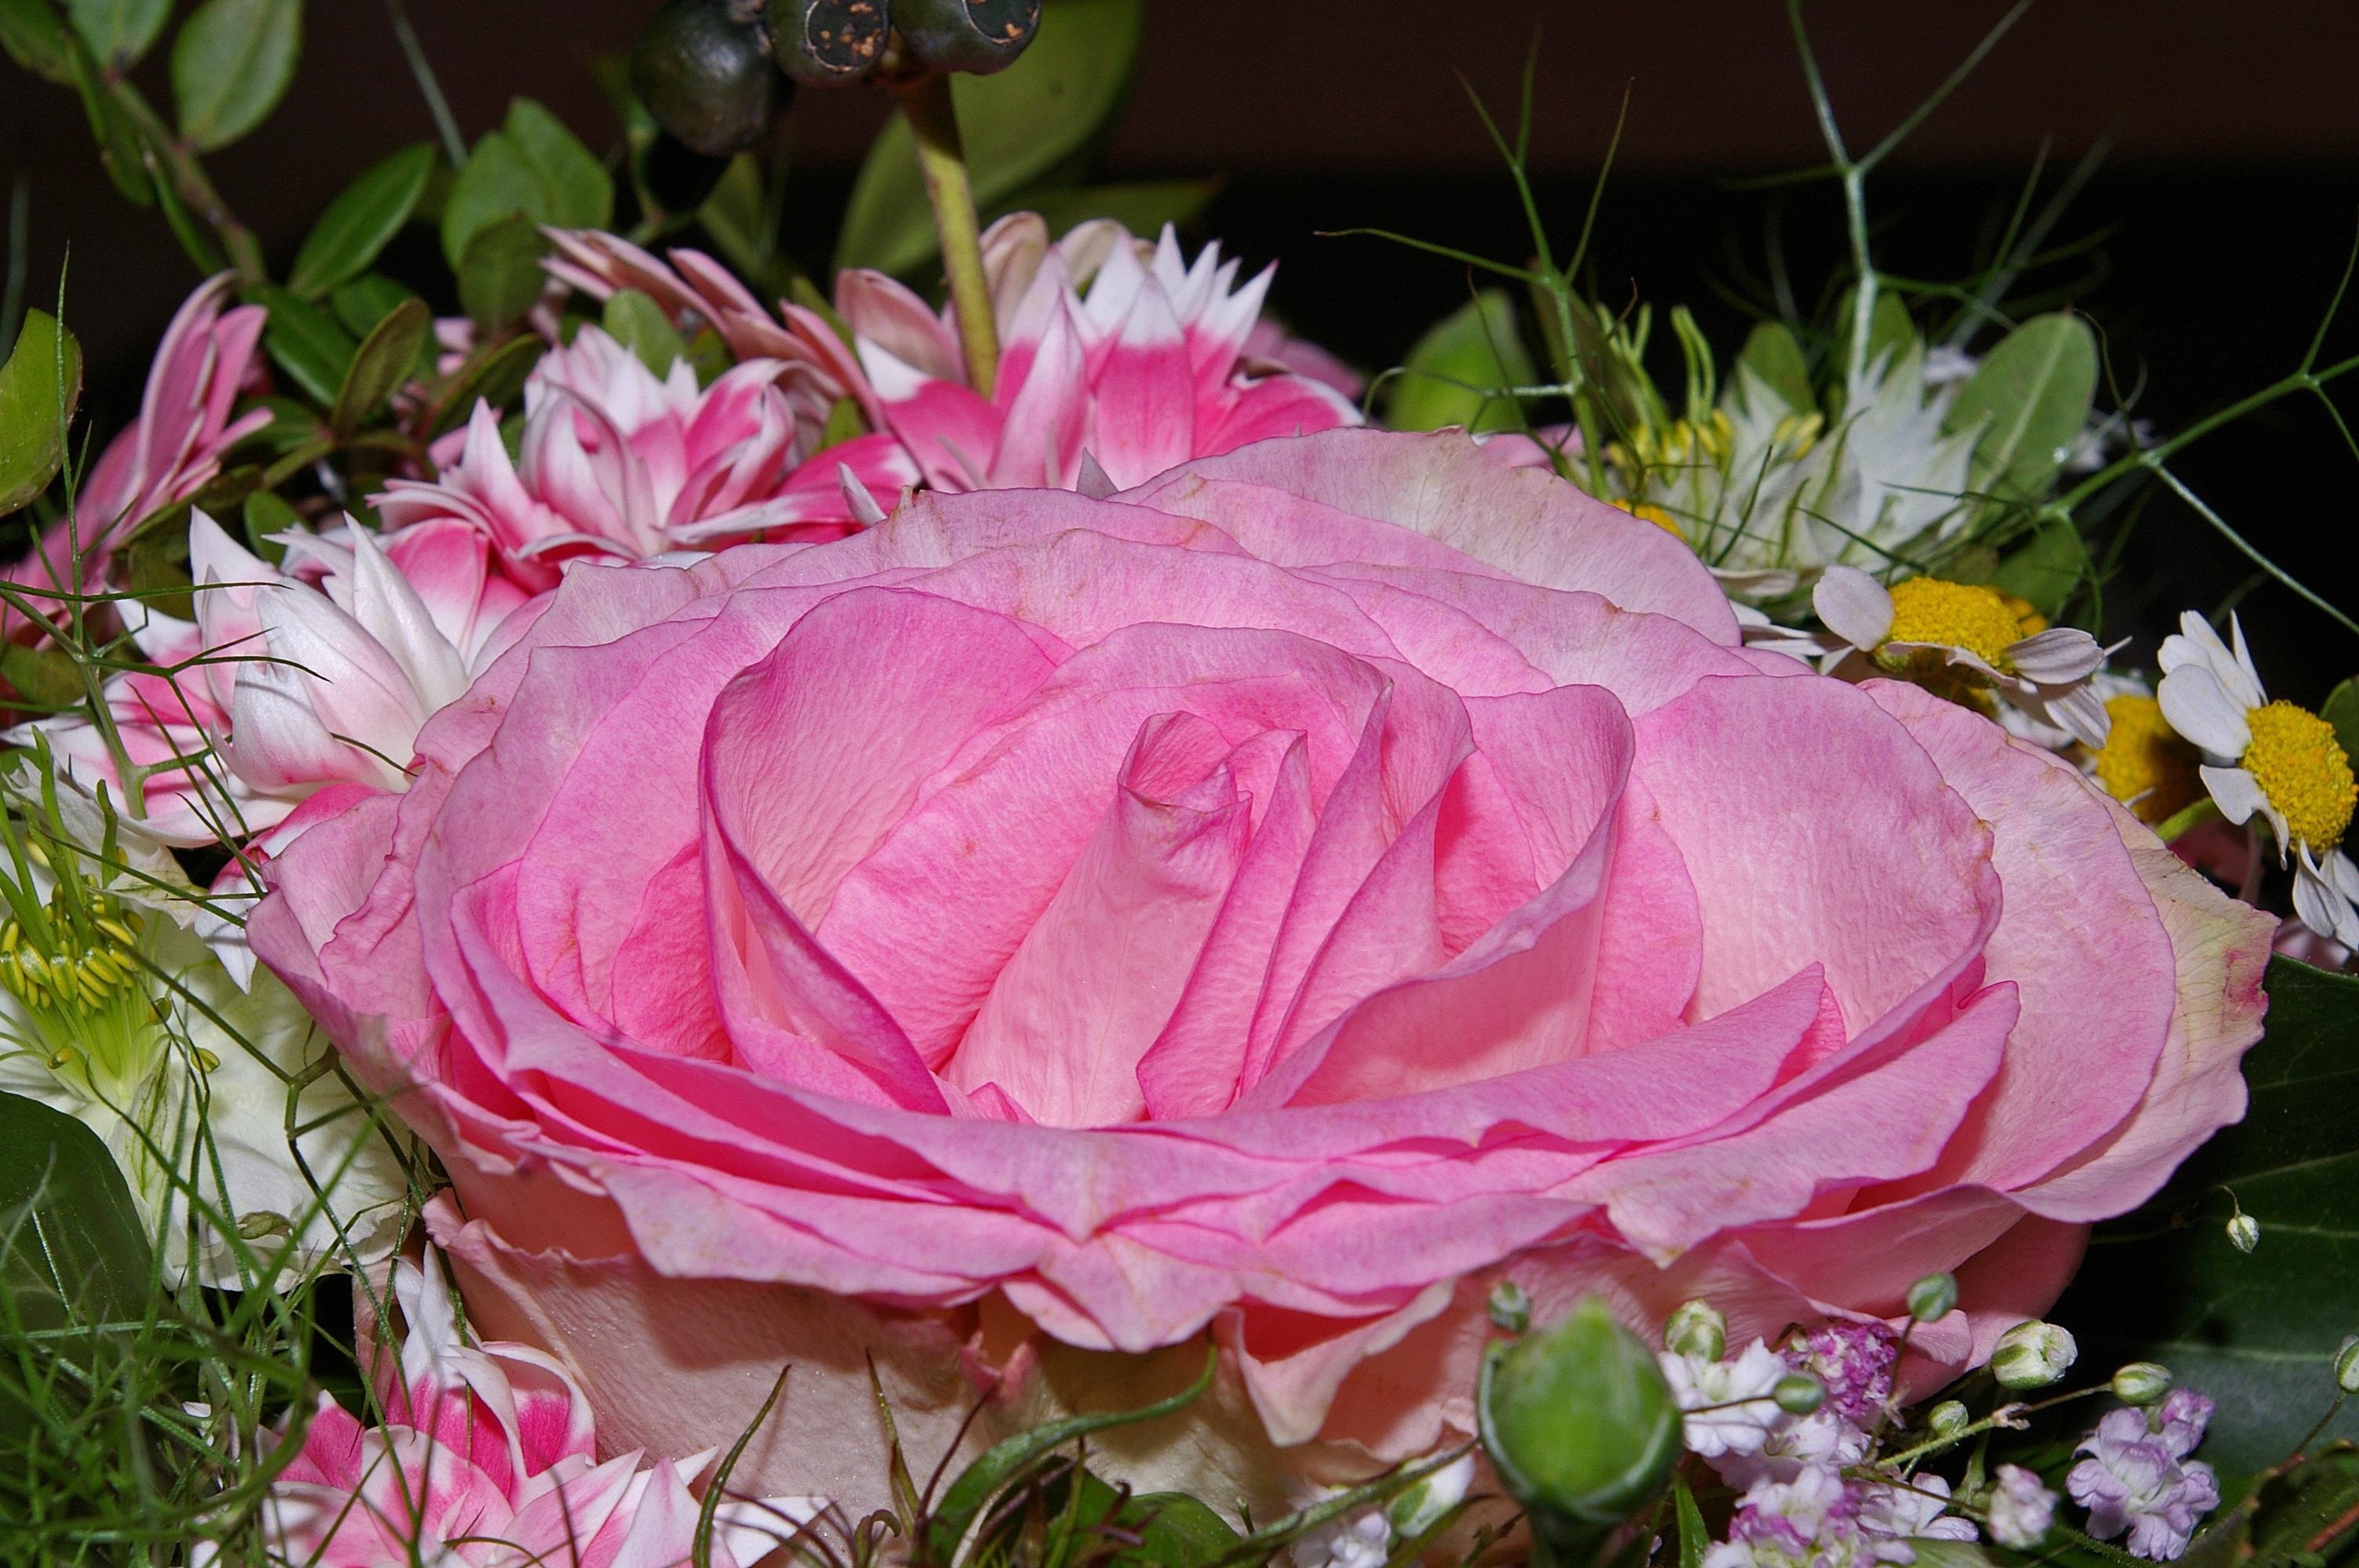 Free images blossom petal vase romance romantic close free images blossom petal vase romance romantic close flowers petals beauty beautiful pink rose birthday bouquets floristry peony izmirmasajfo